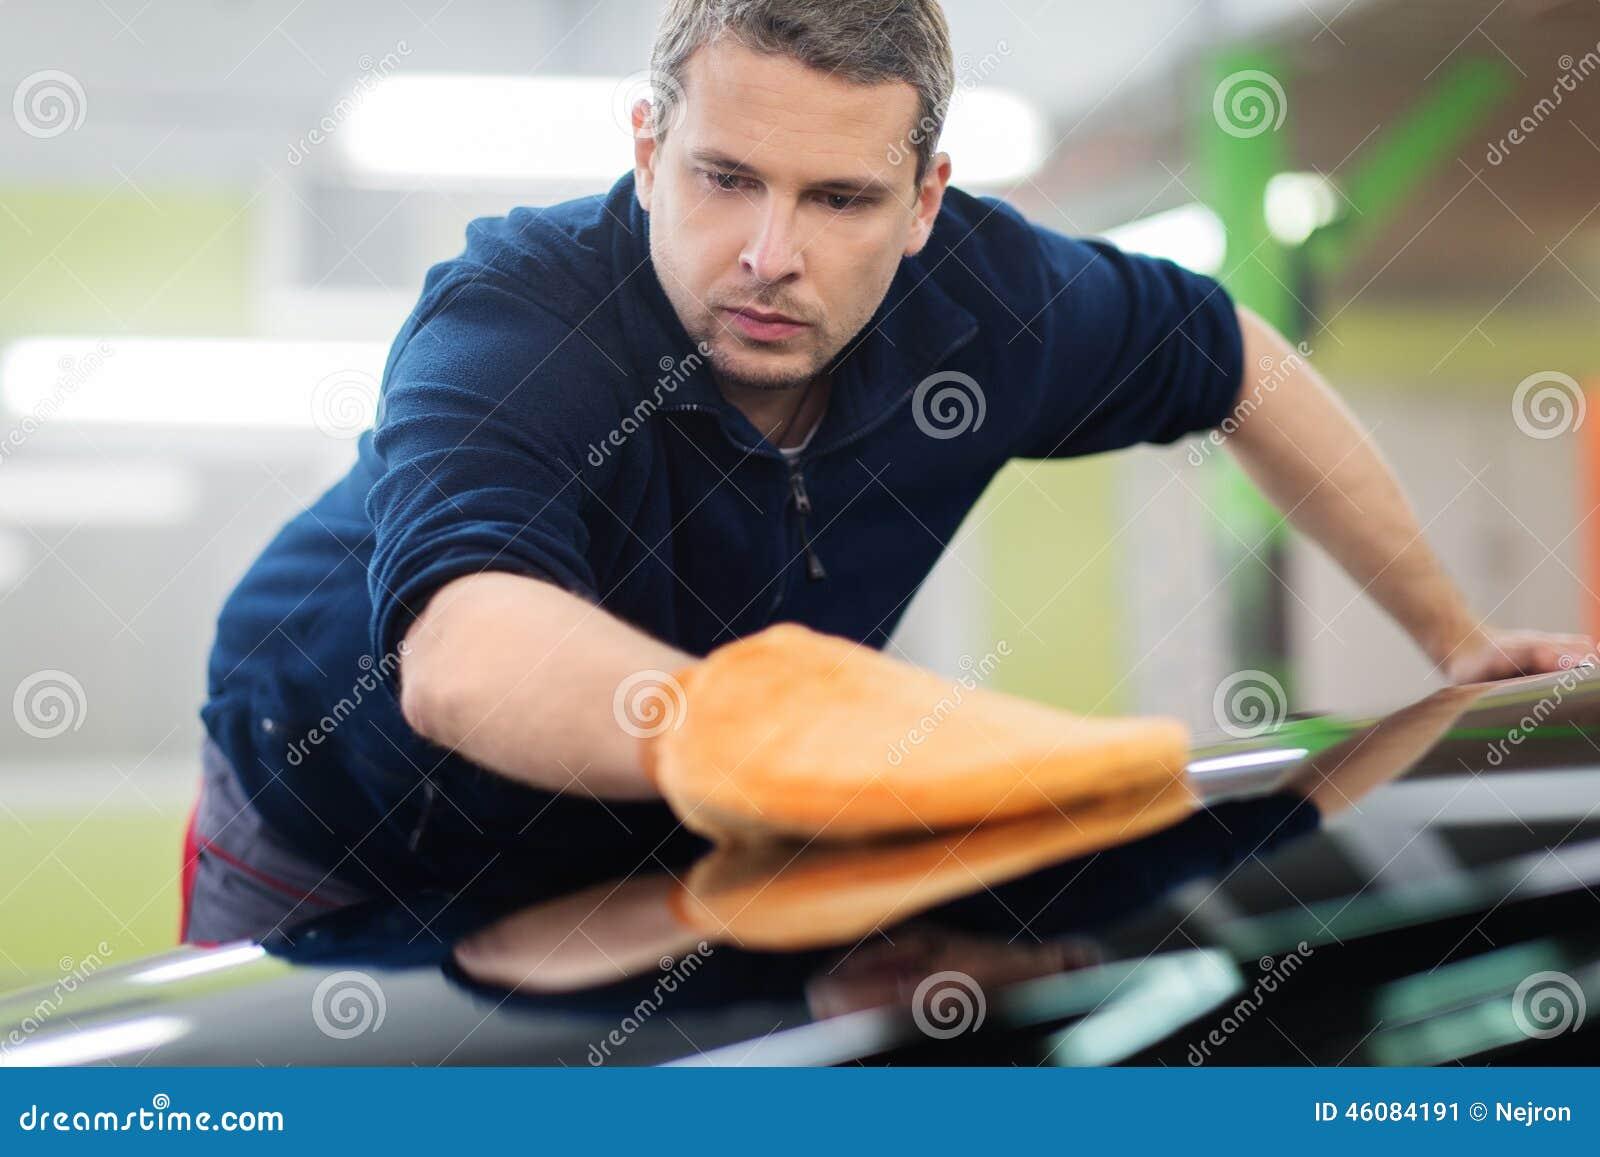 Hand Wash Car Wash >> Worker On A Car Wash Stock Photo - Image: 46084191